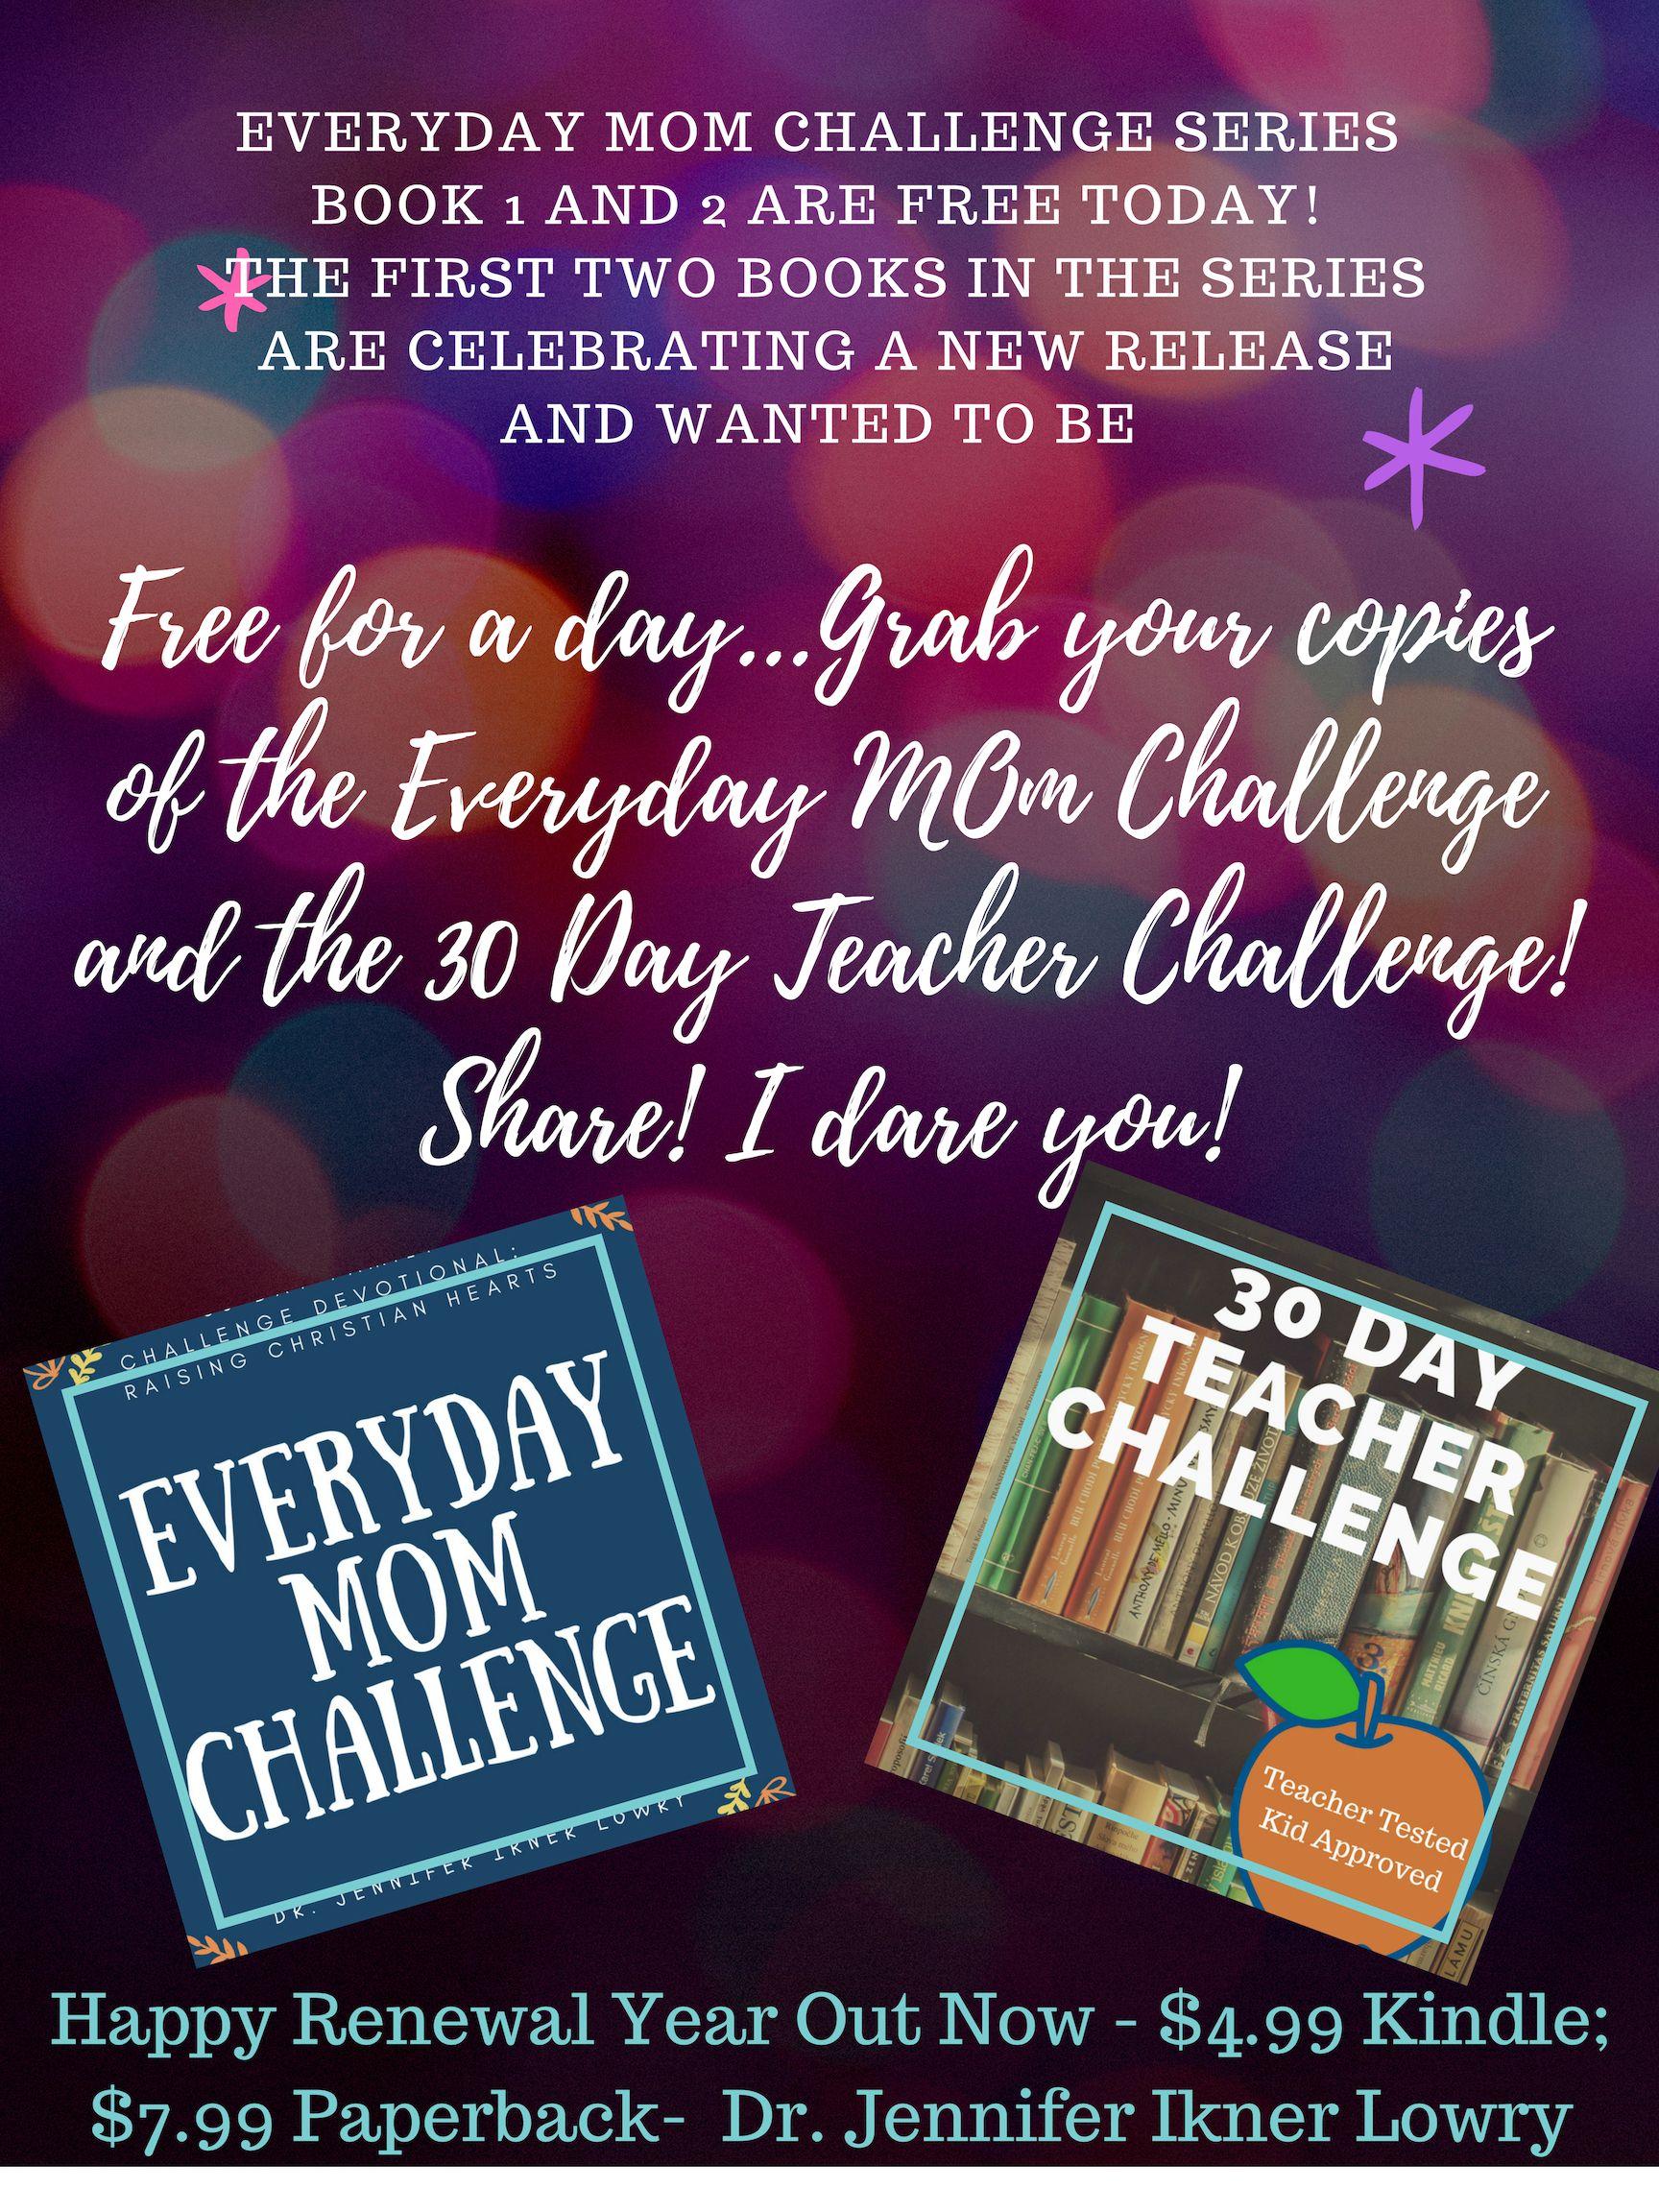 Dr Jennifer Ikner Lowry Amazon Mom Challenge Free Ebooks Books